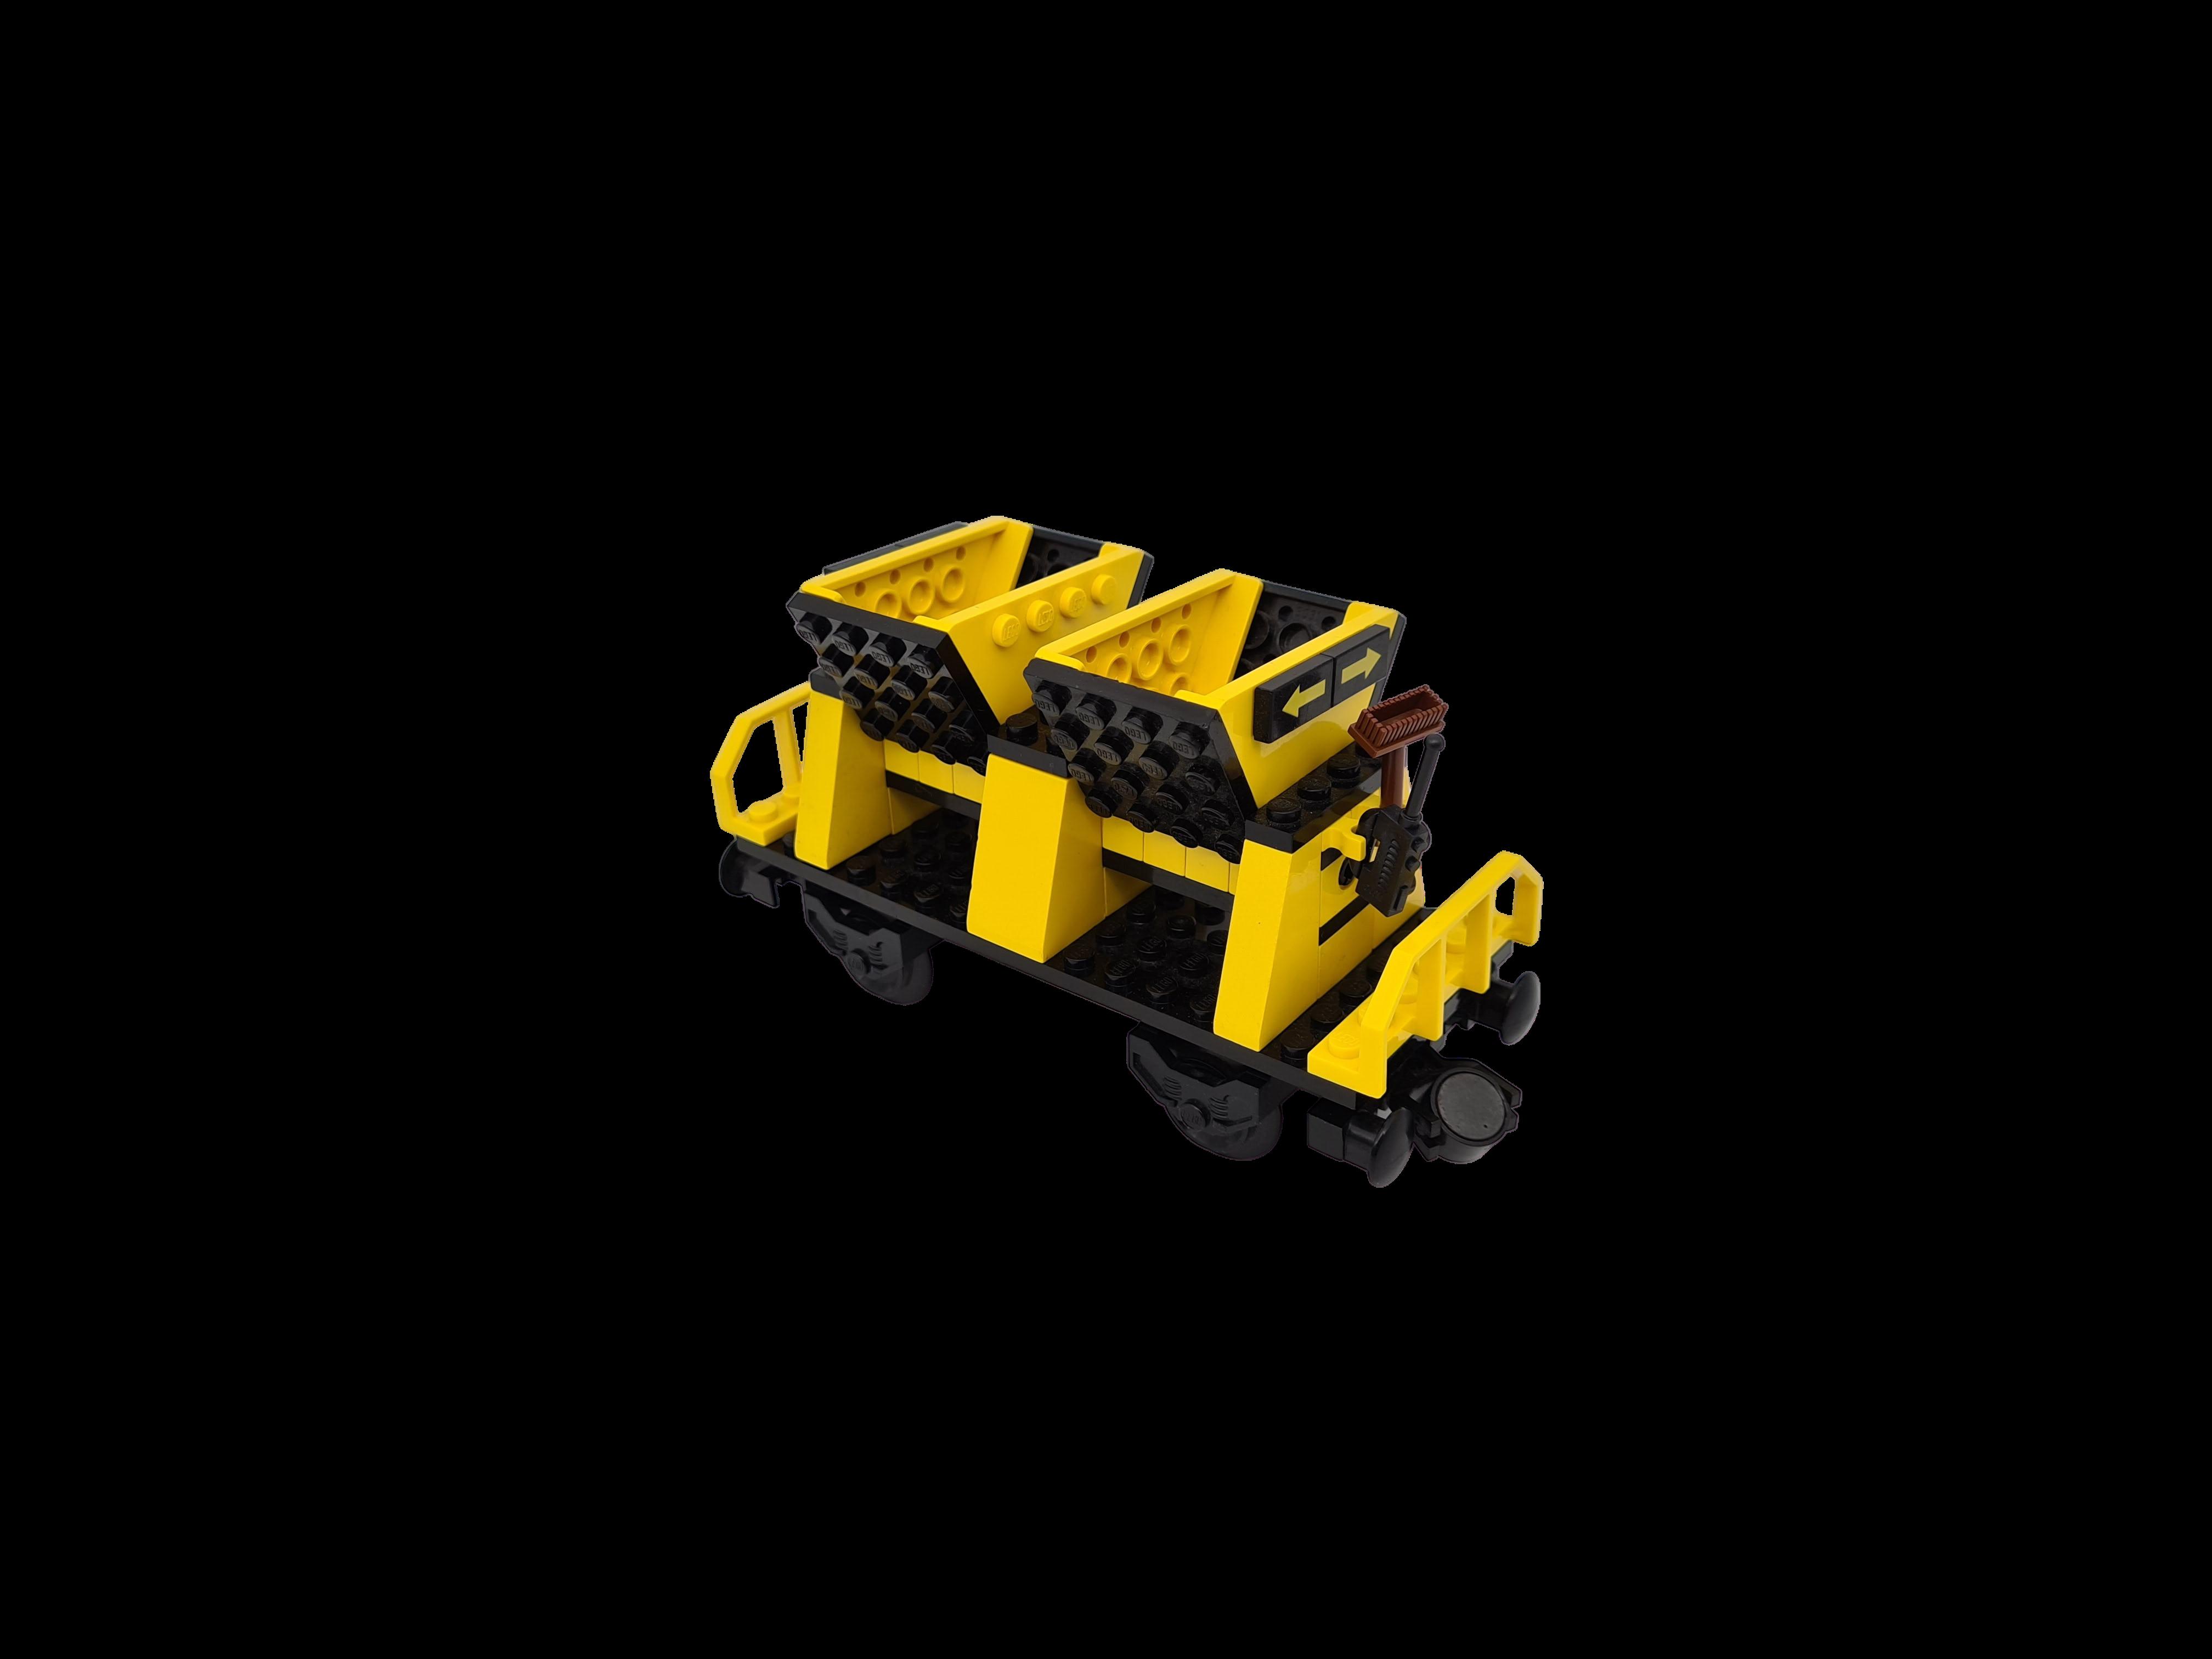 Lego 9V RC Eisenbahn TRAIN Kipper Ladegut Bauteil GELB